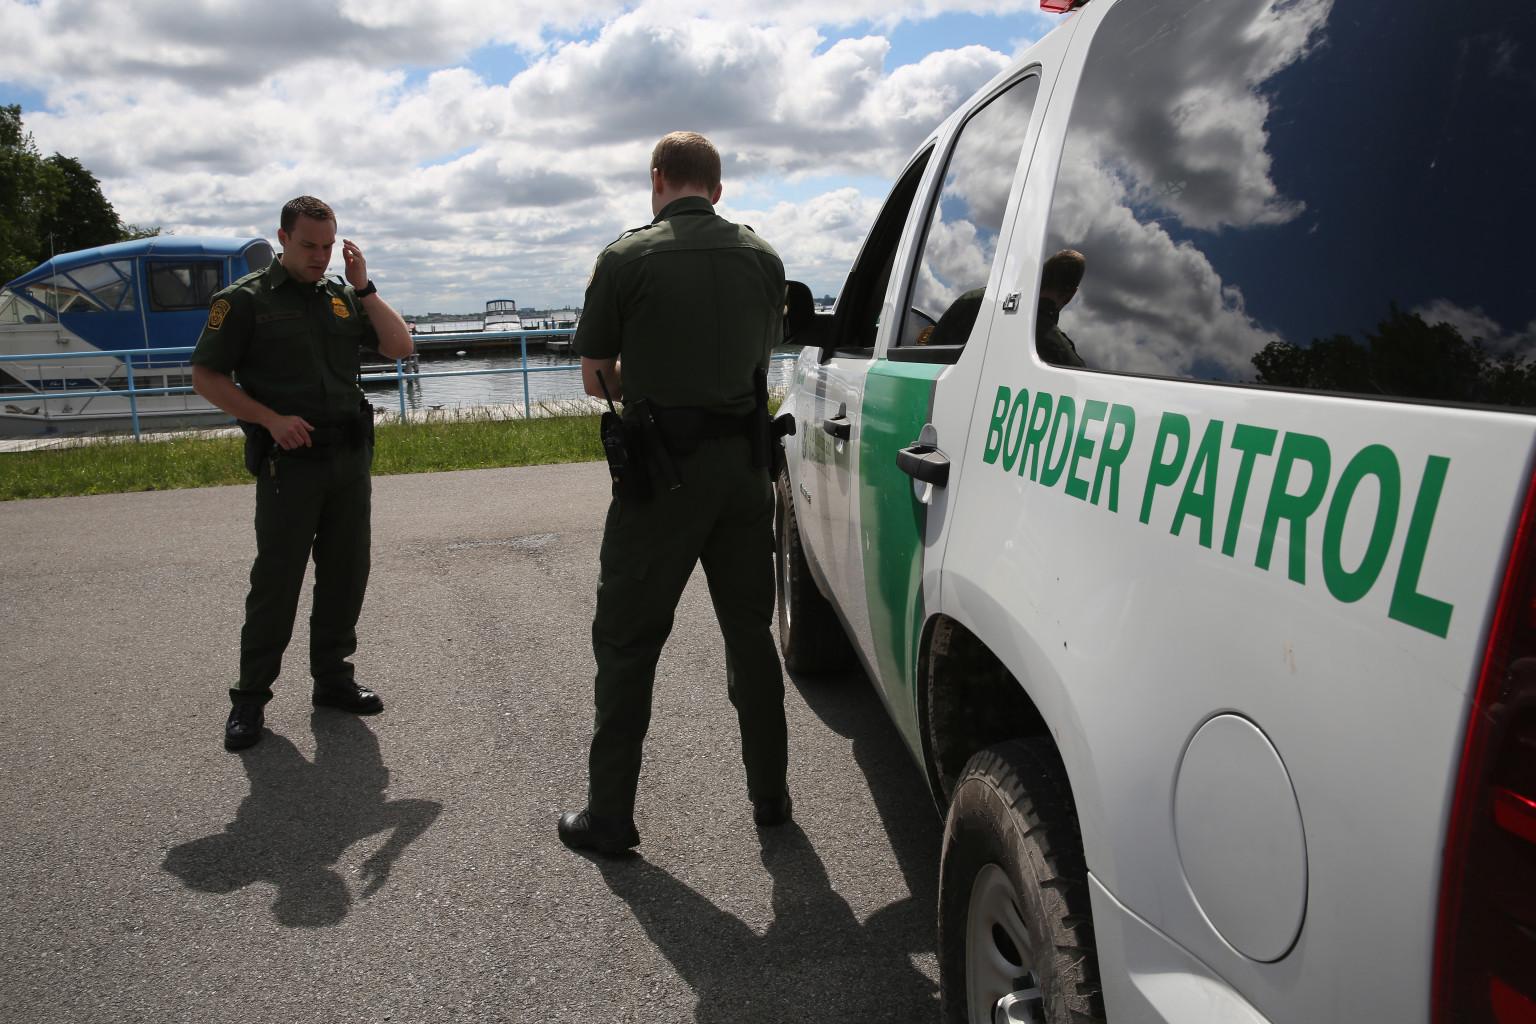 latino civil rights violated when border patrol responds